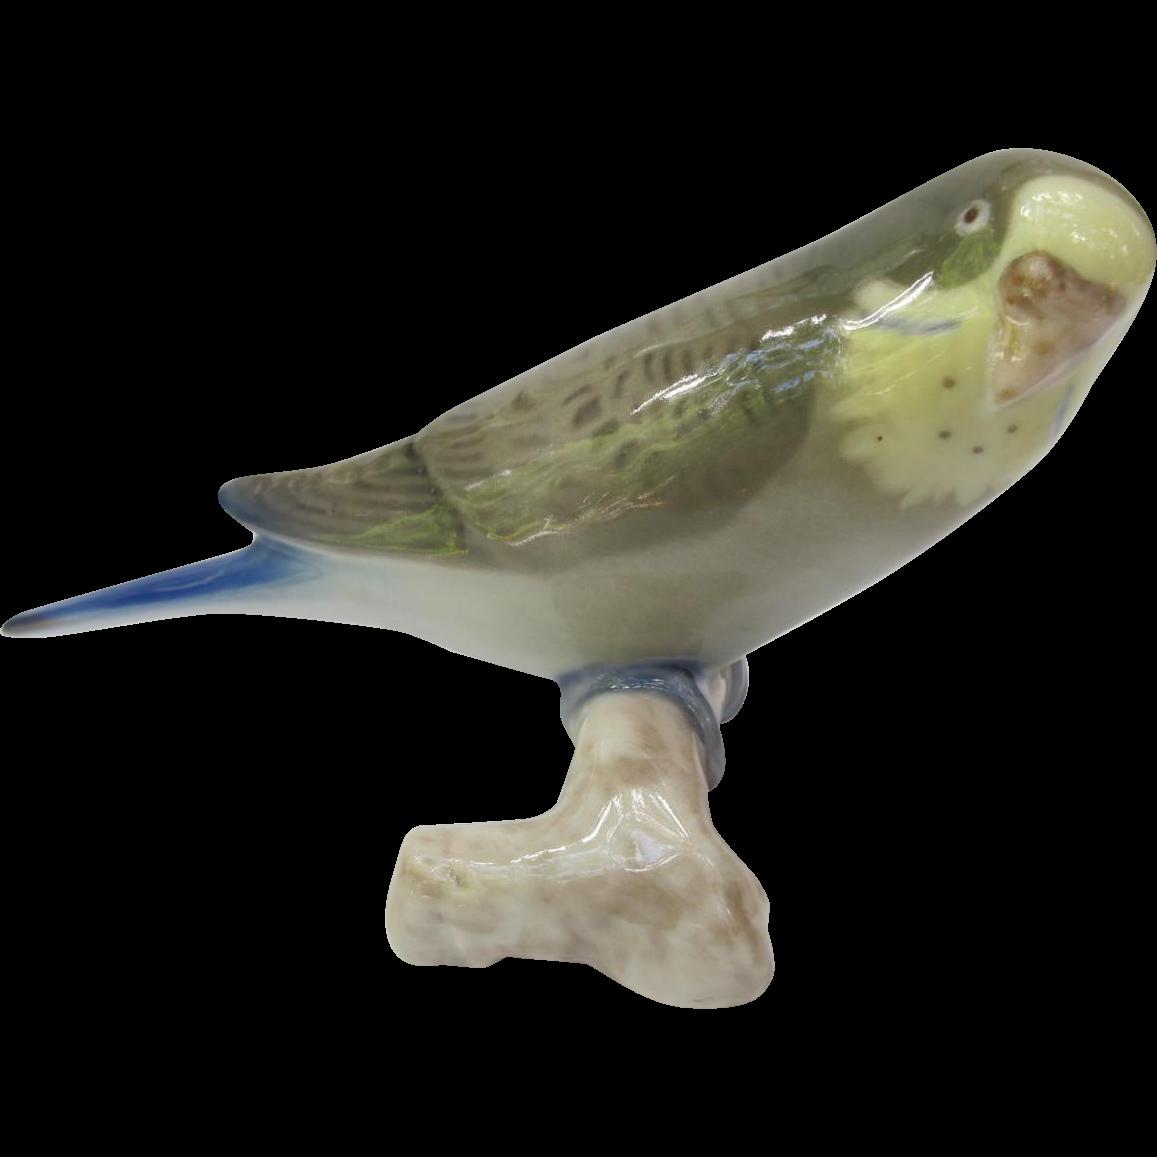 Vintage Bing and Grondahl Green Budgie Parakeet Figurine